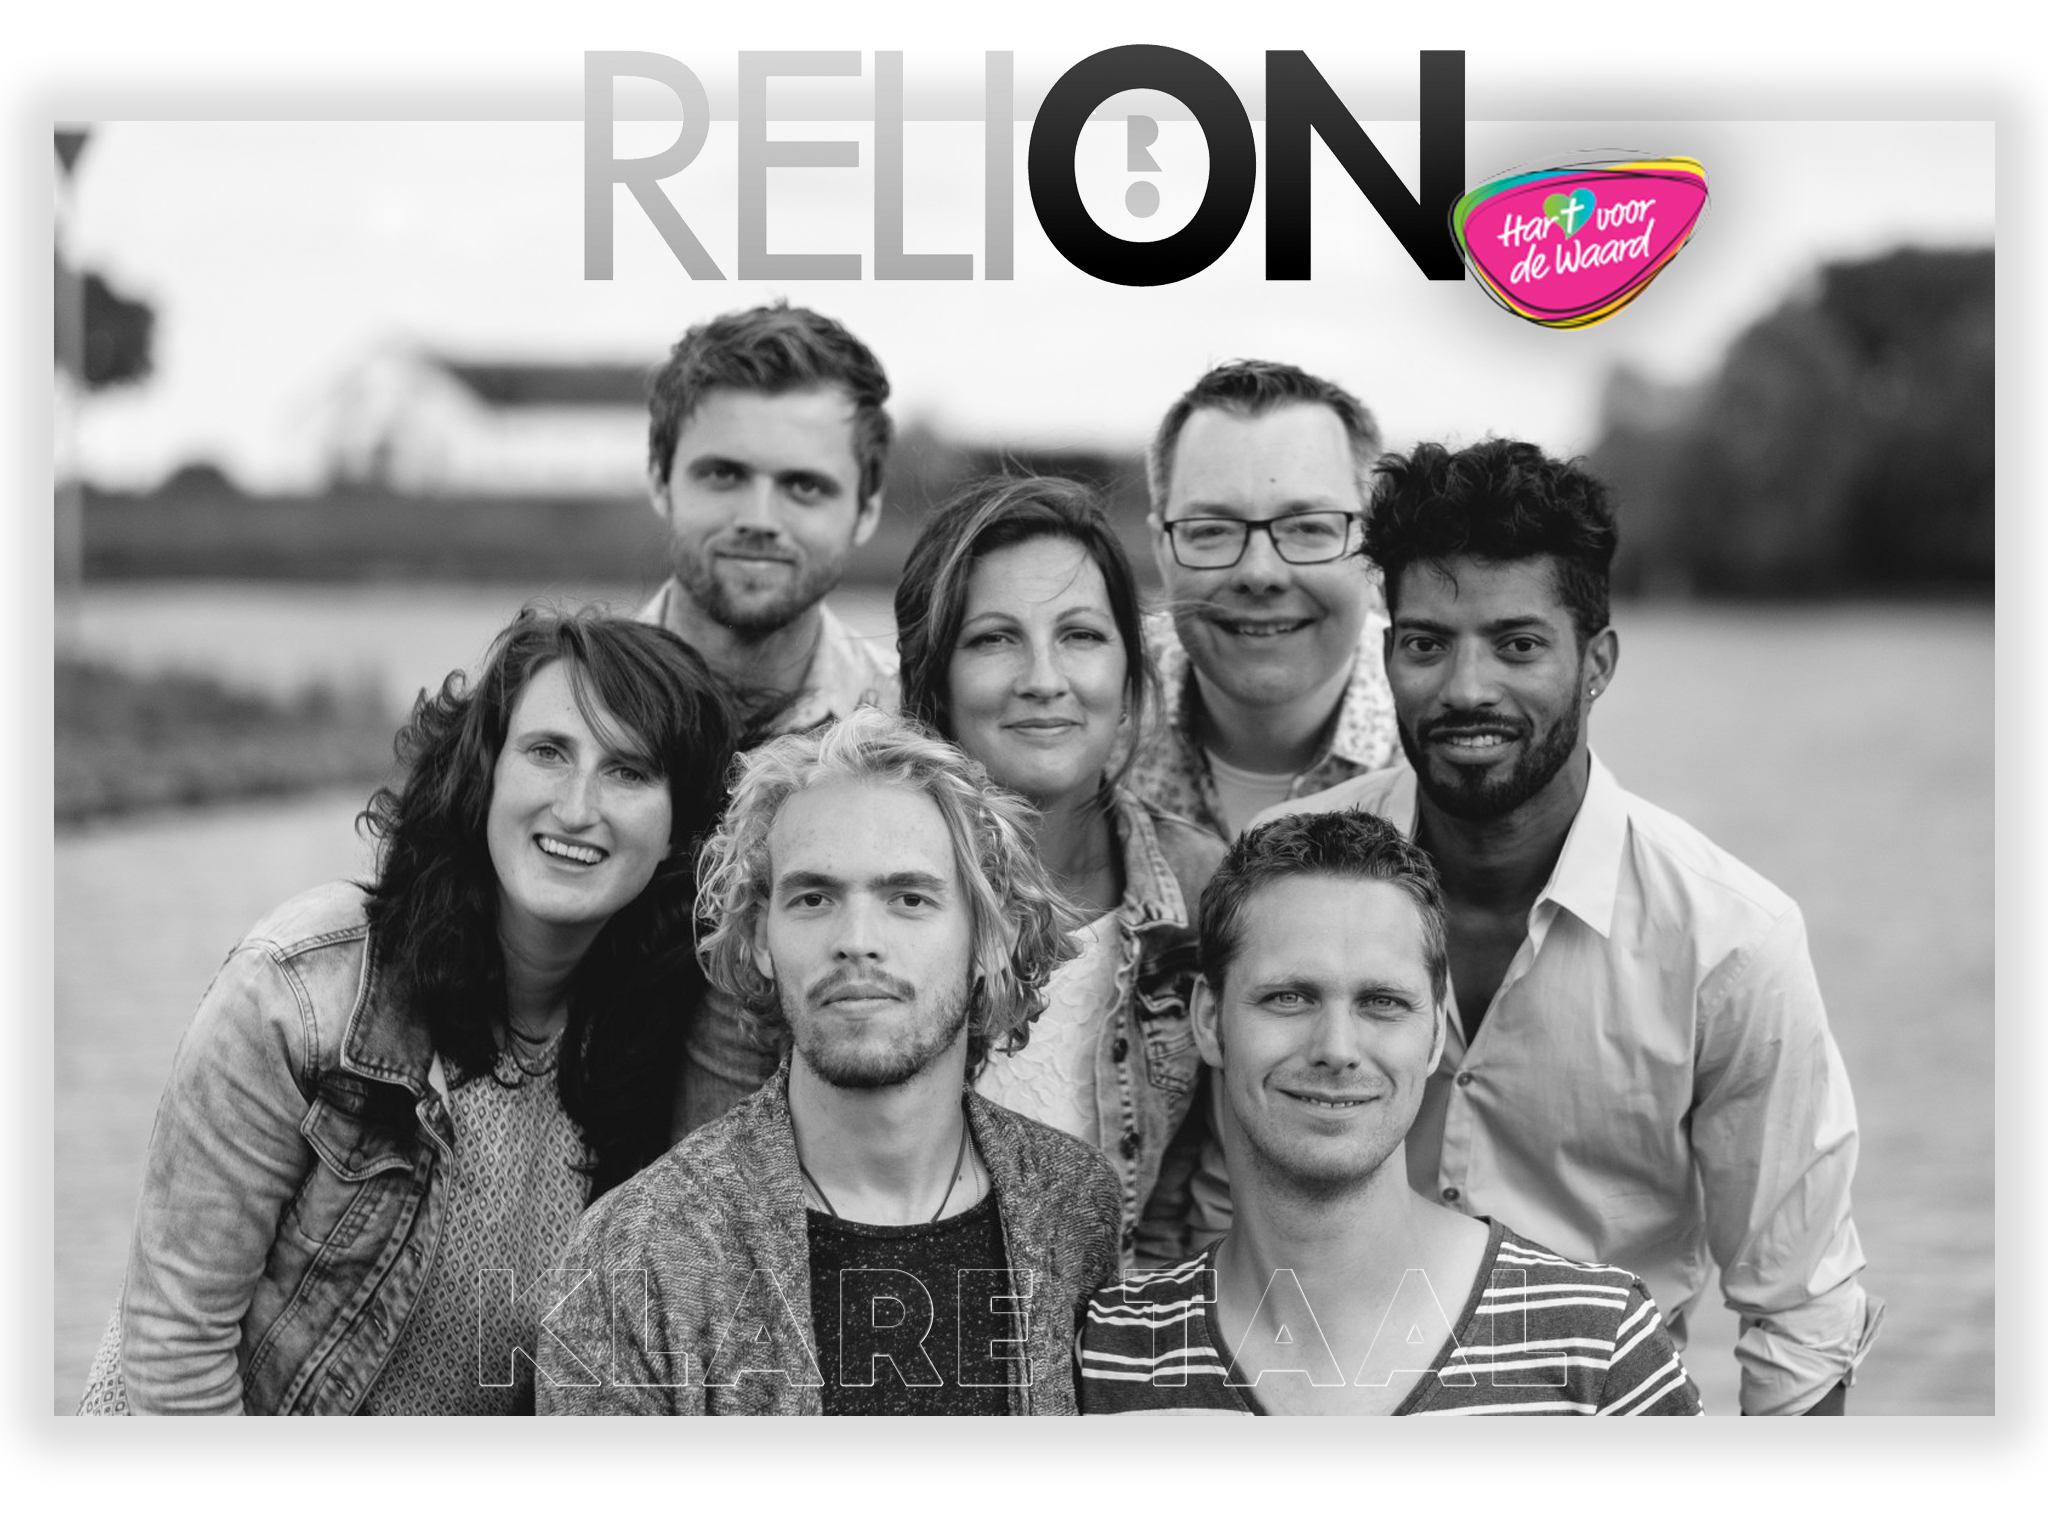 Klare Taal - Relion